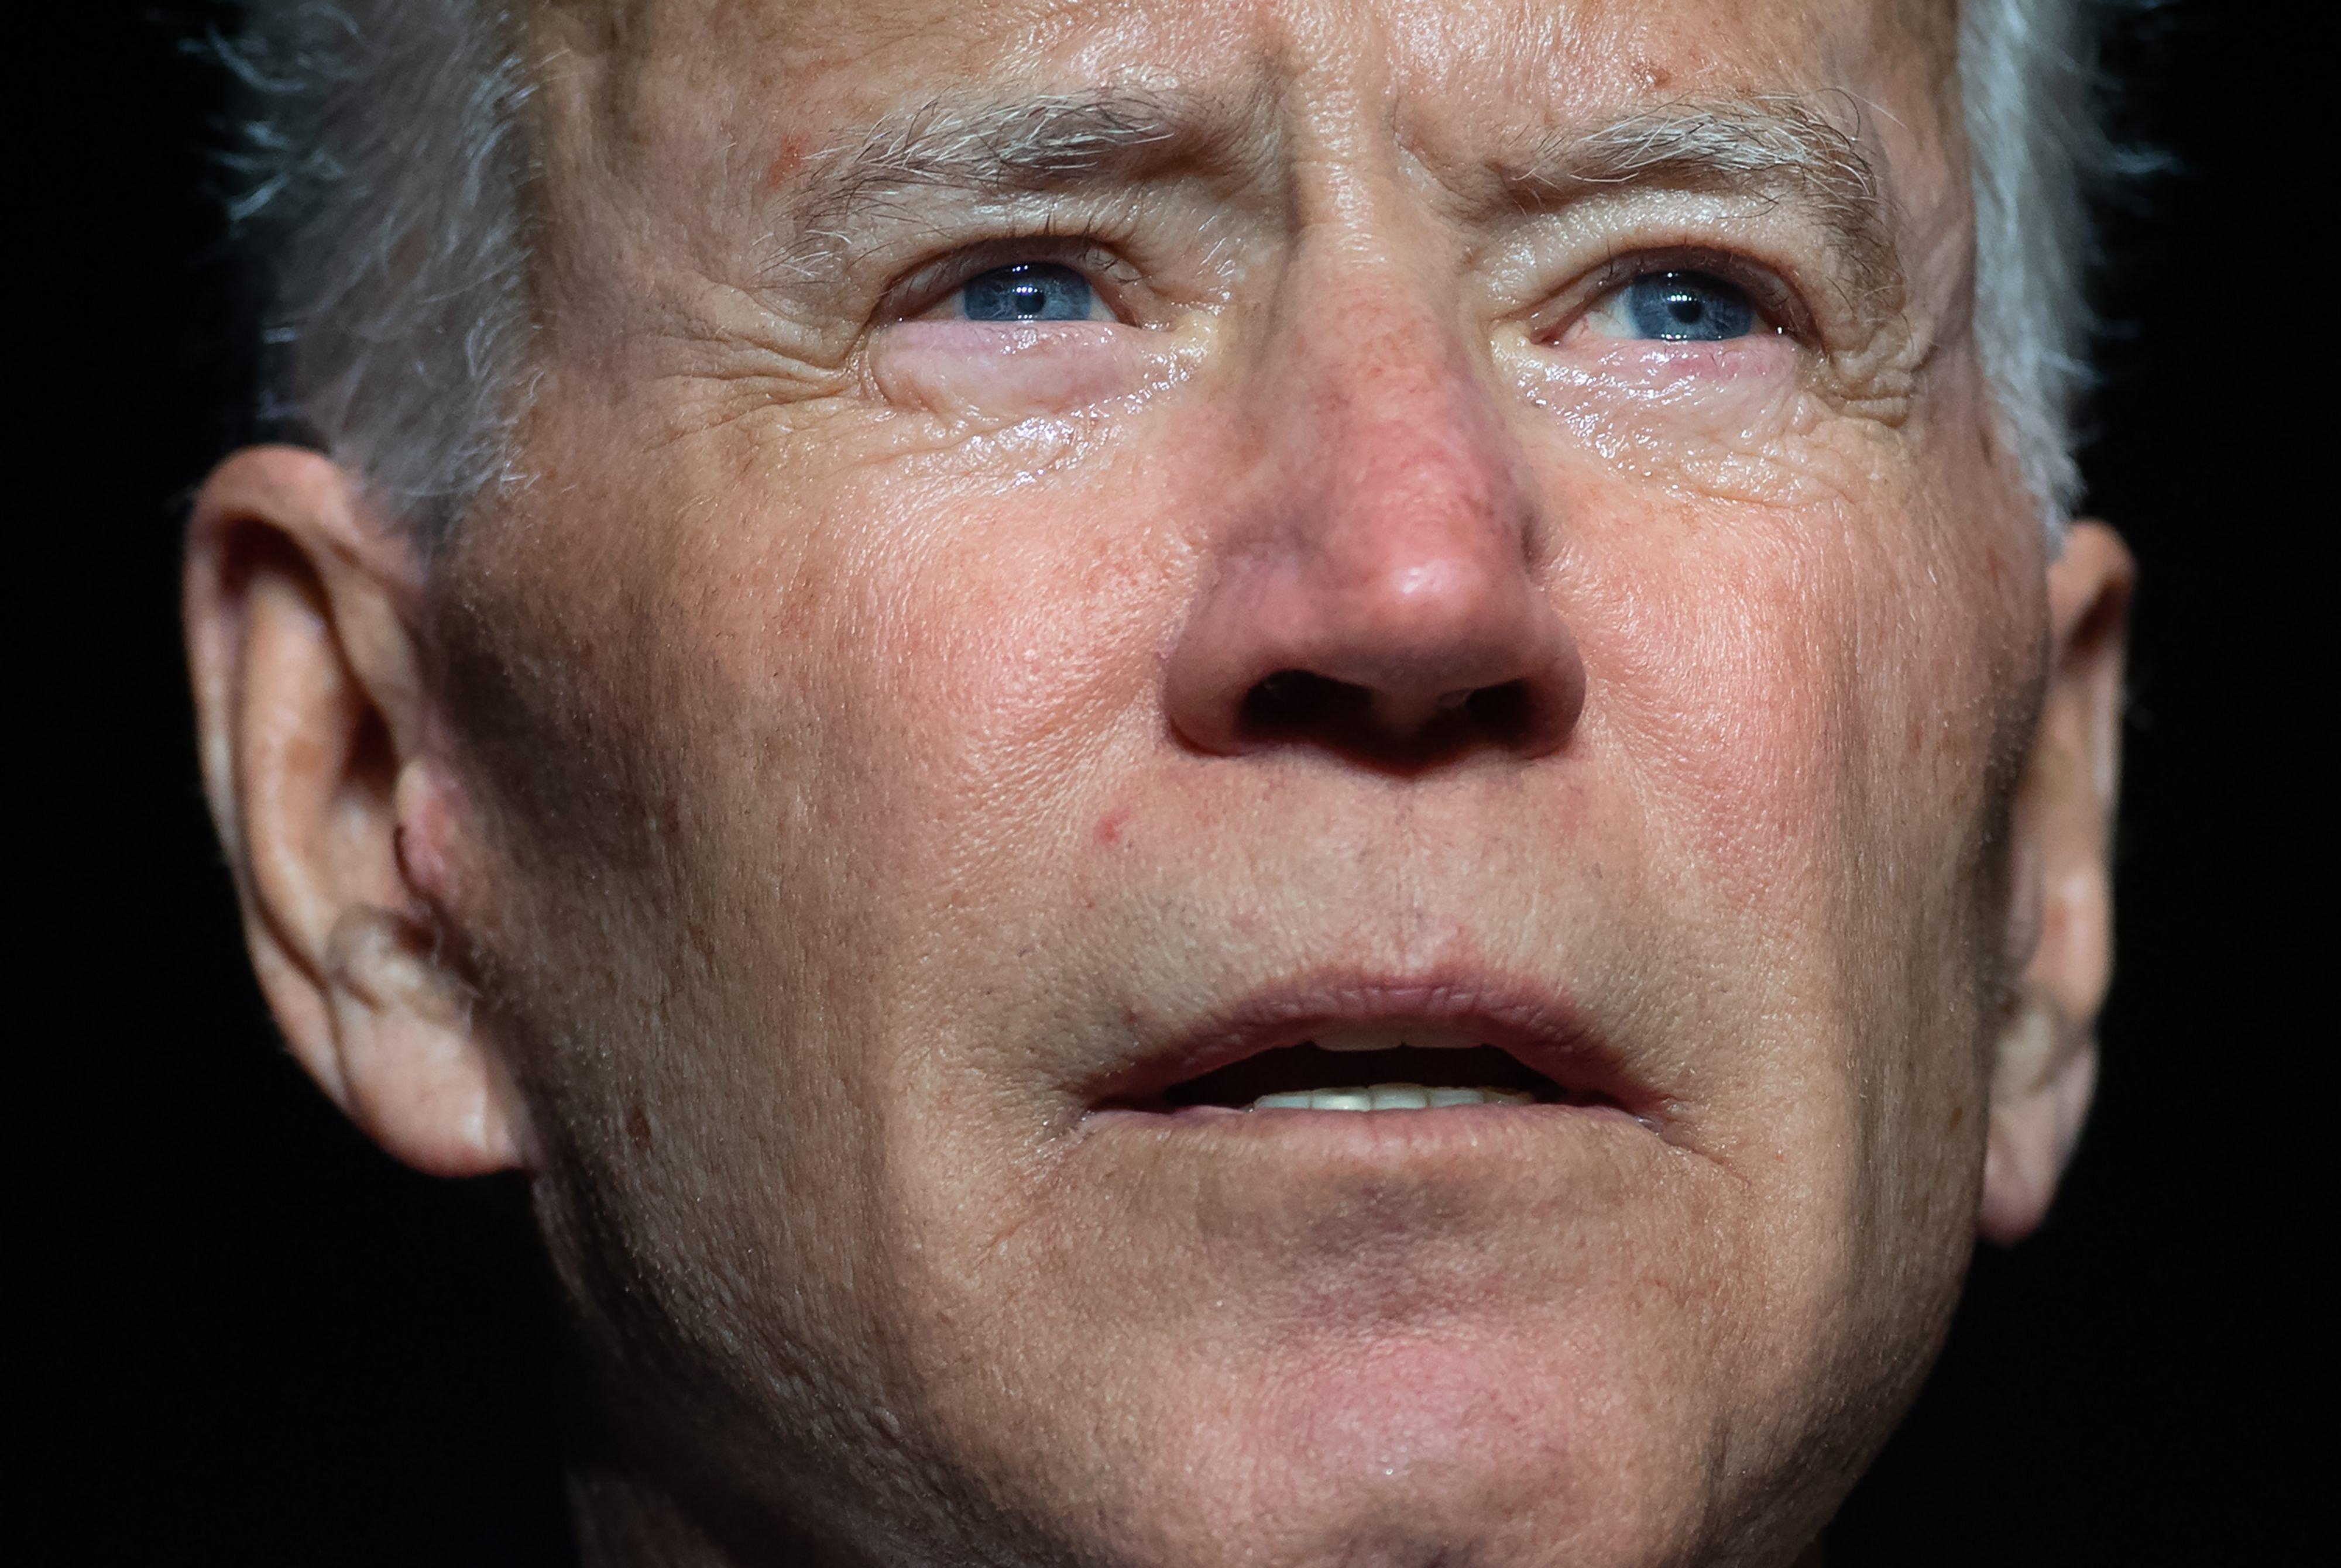 Joe Biden's Proudest Achievement Looks A Lot More Complicated In